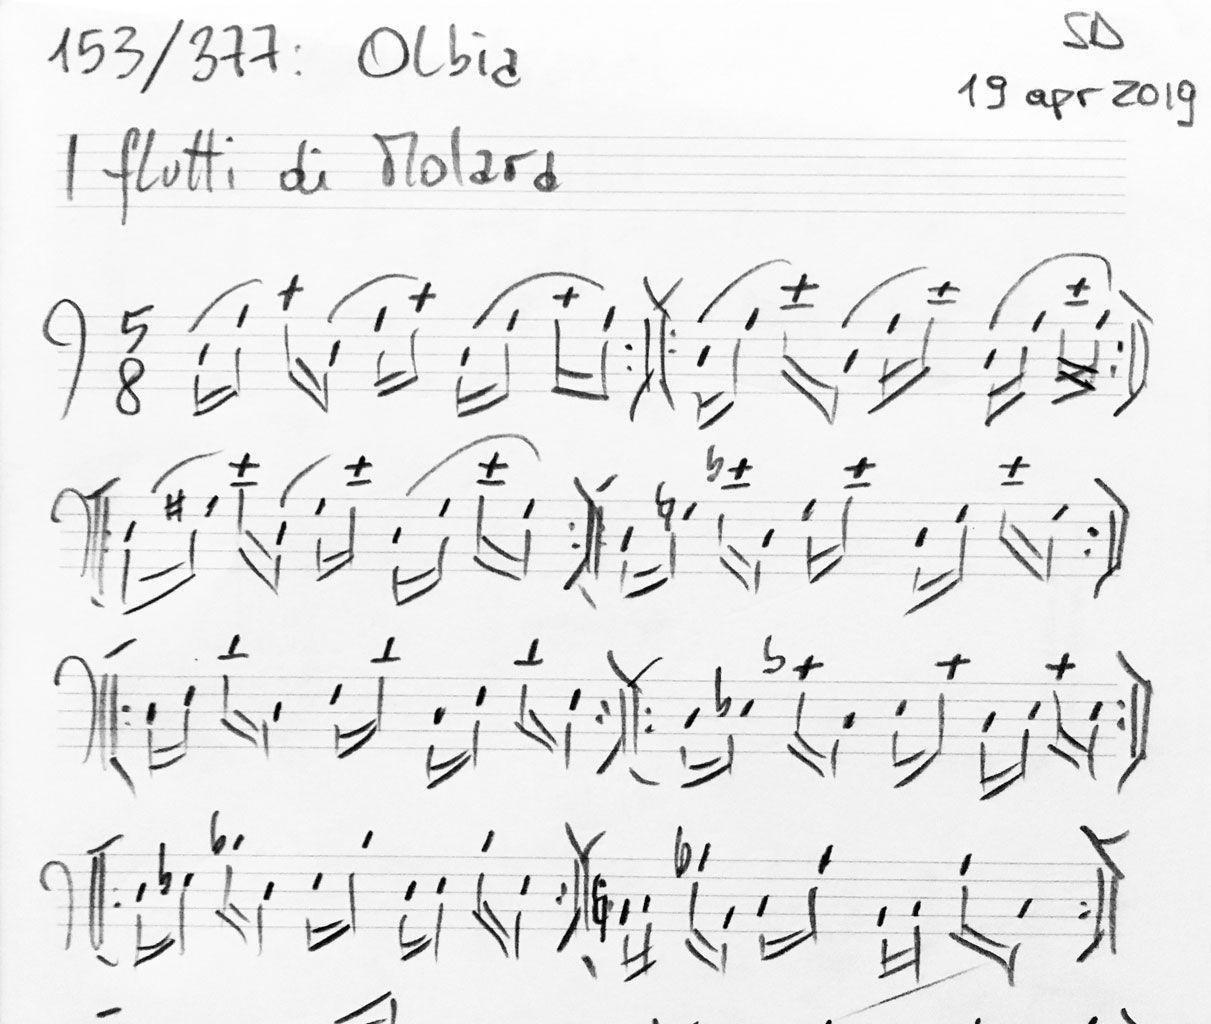 153-Olbia-score